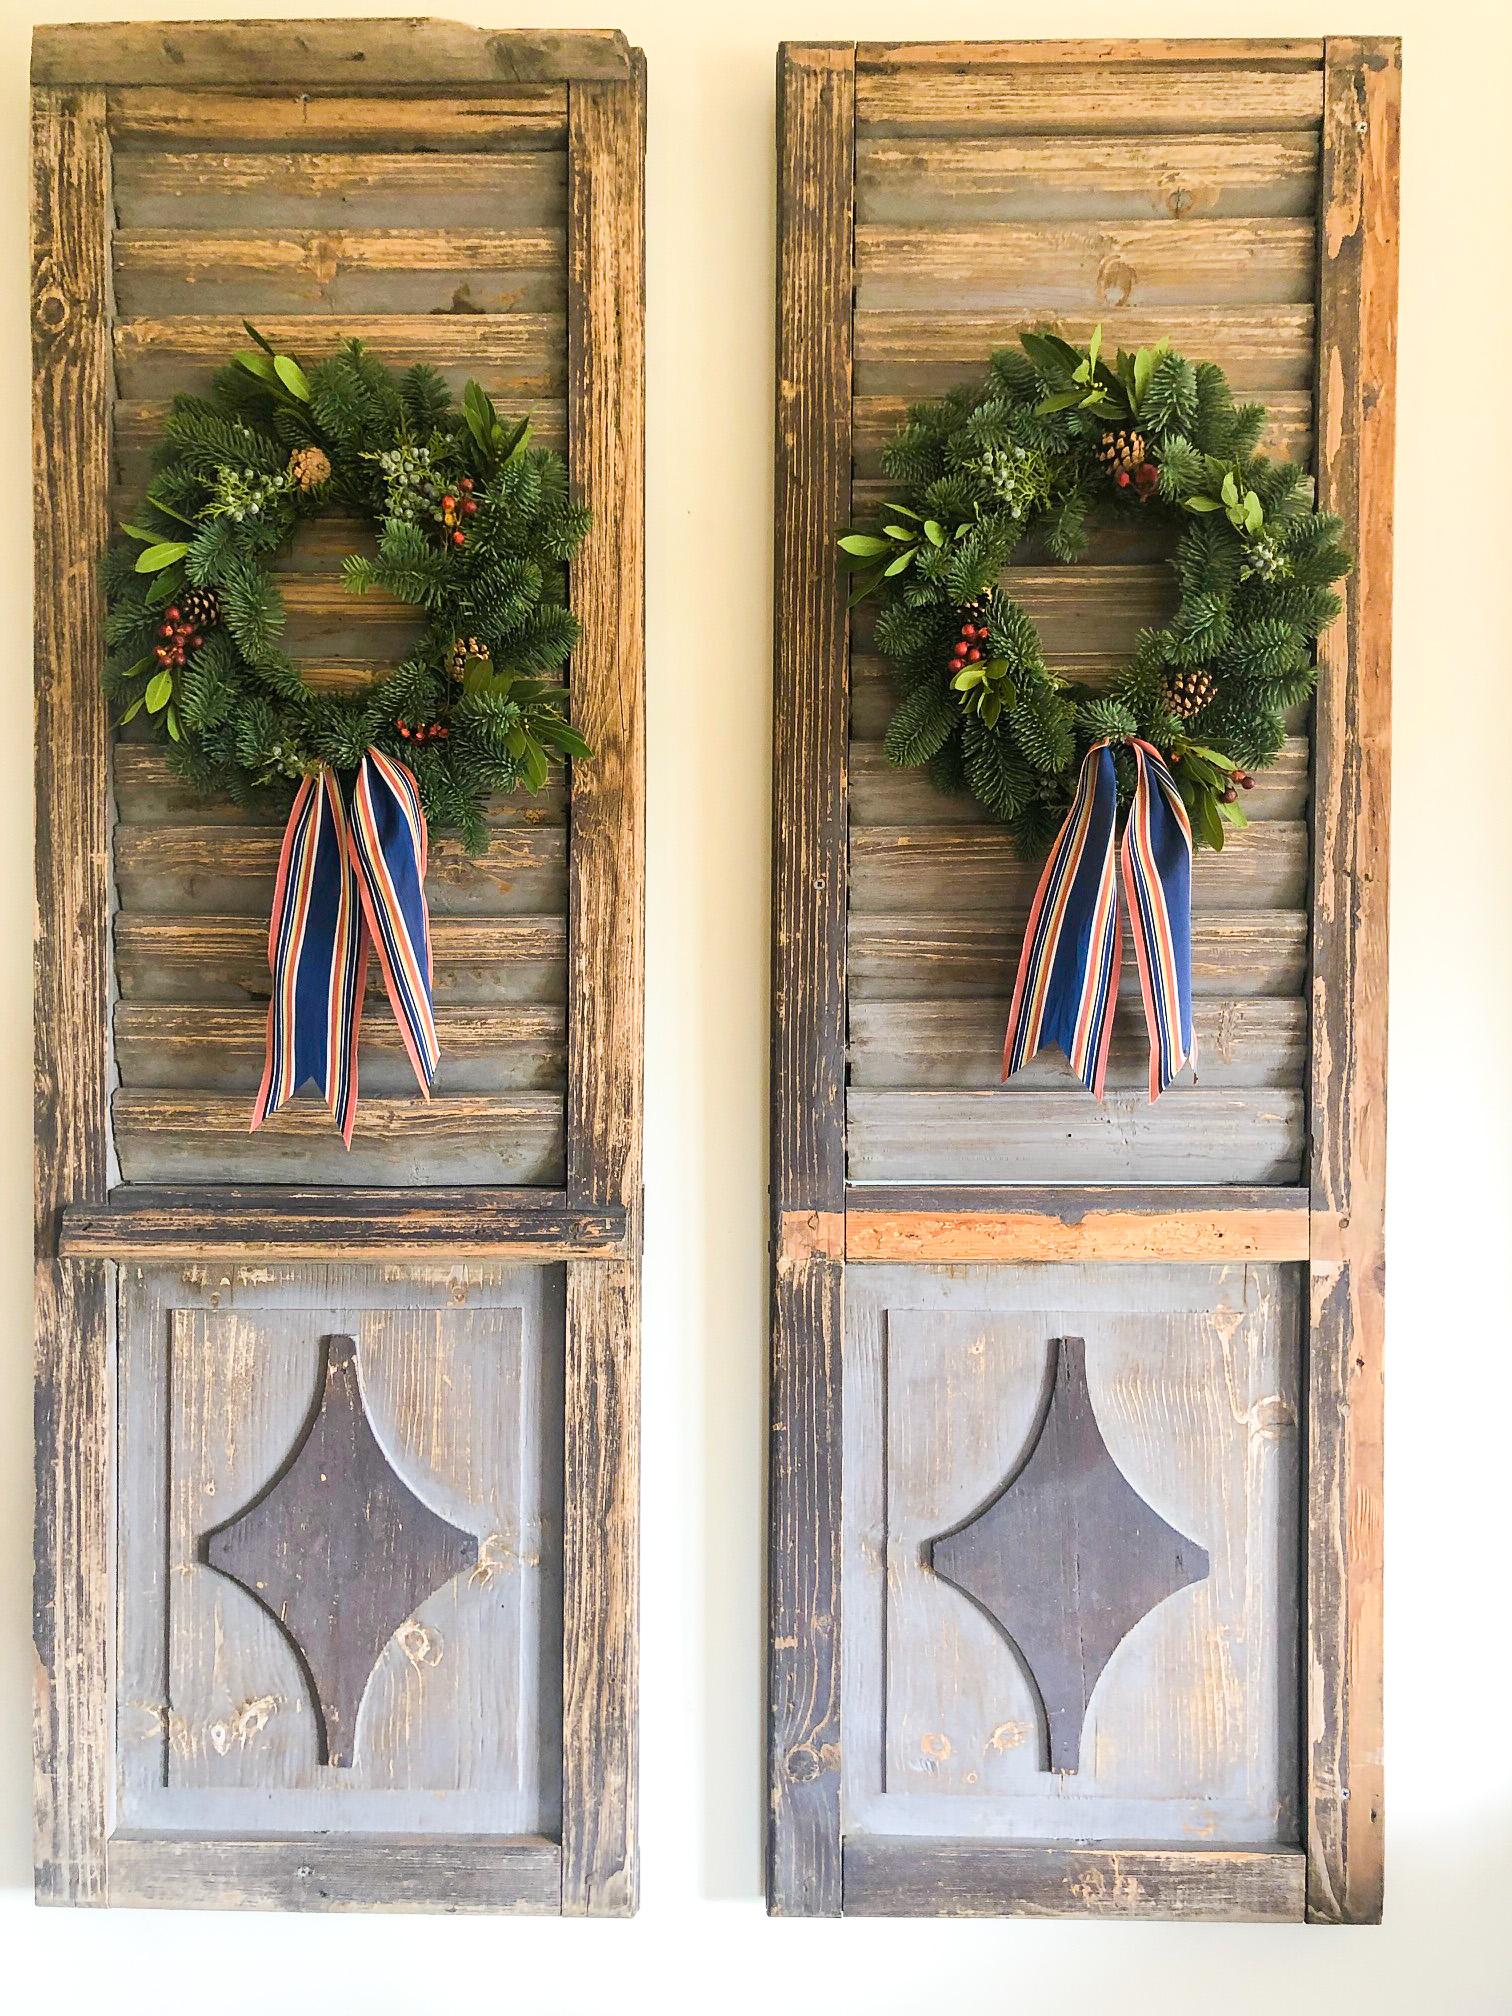 trader joe's wreaths on vintage shutters